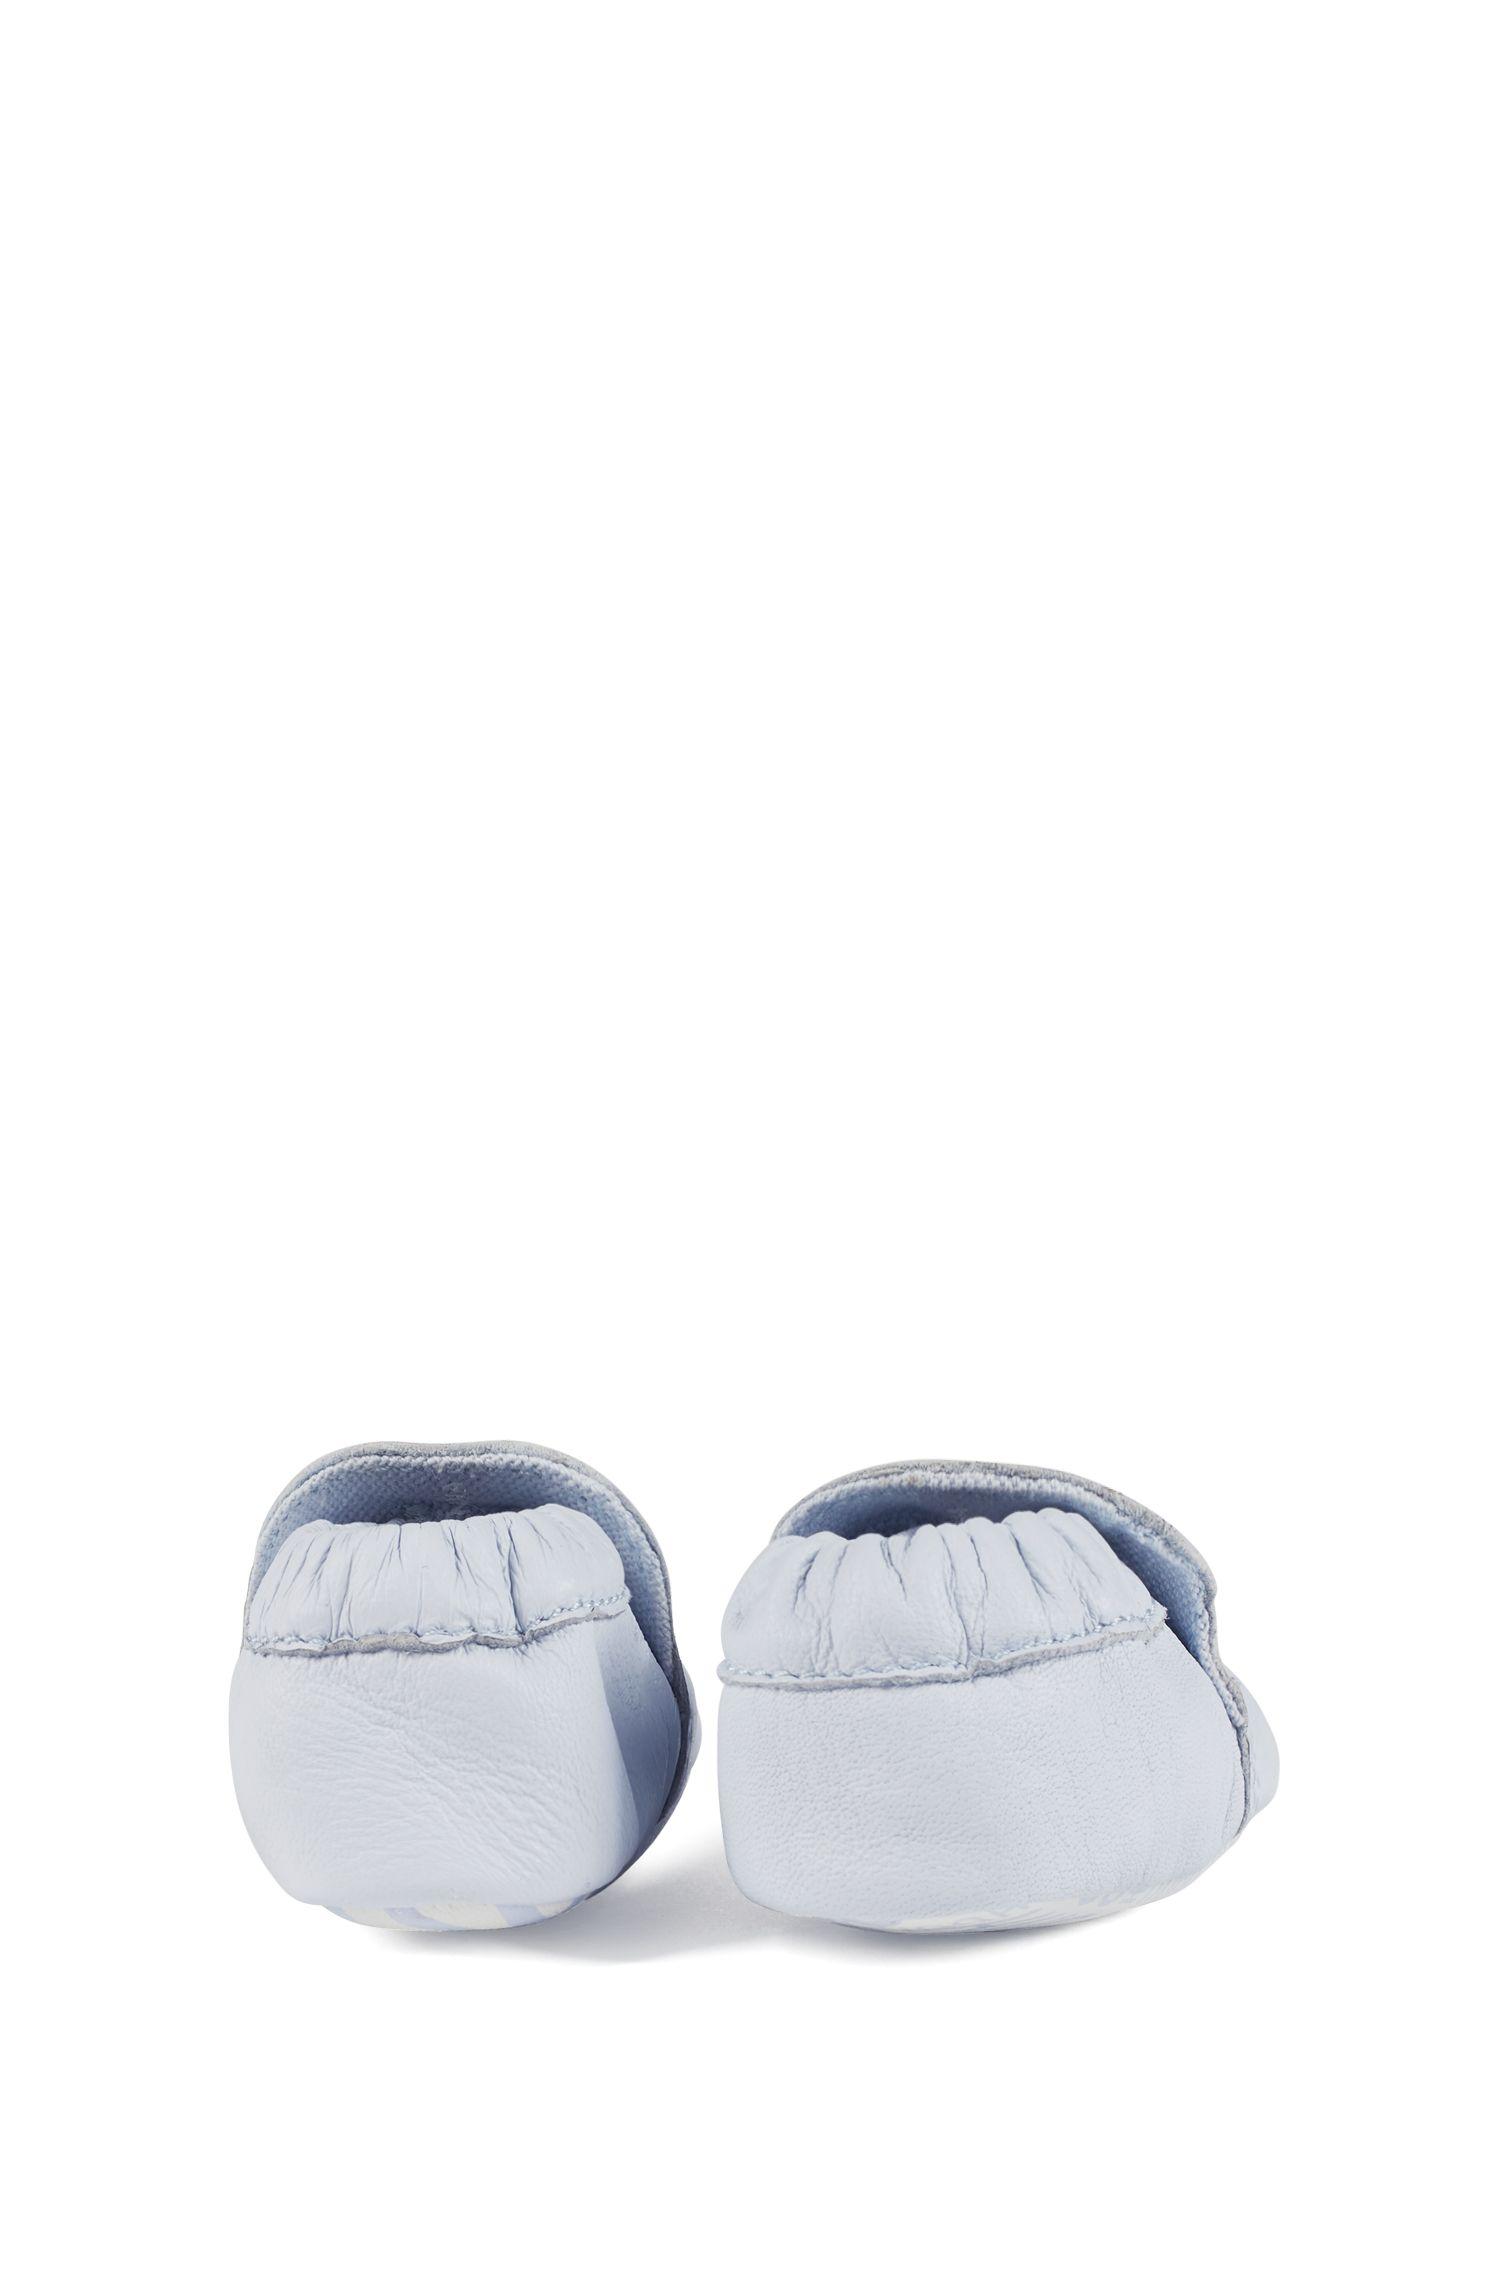 Baby-Boots aus echtem Leder mit Logo-Details, Hellblau